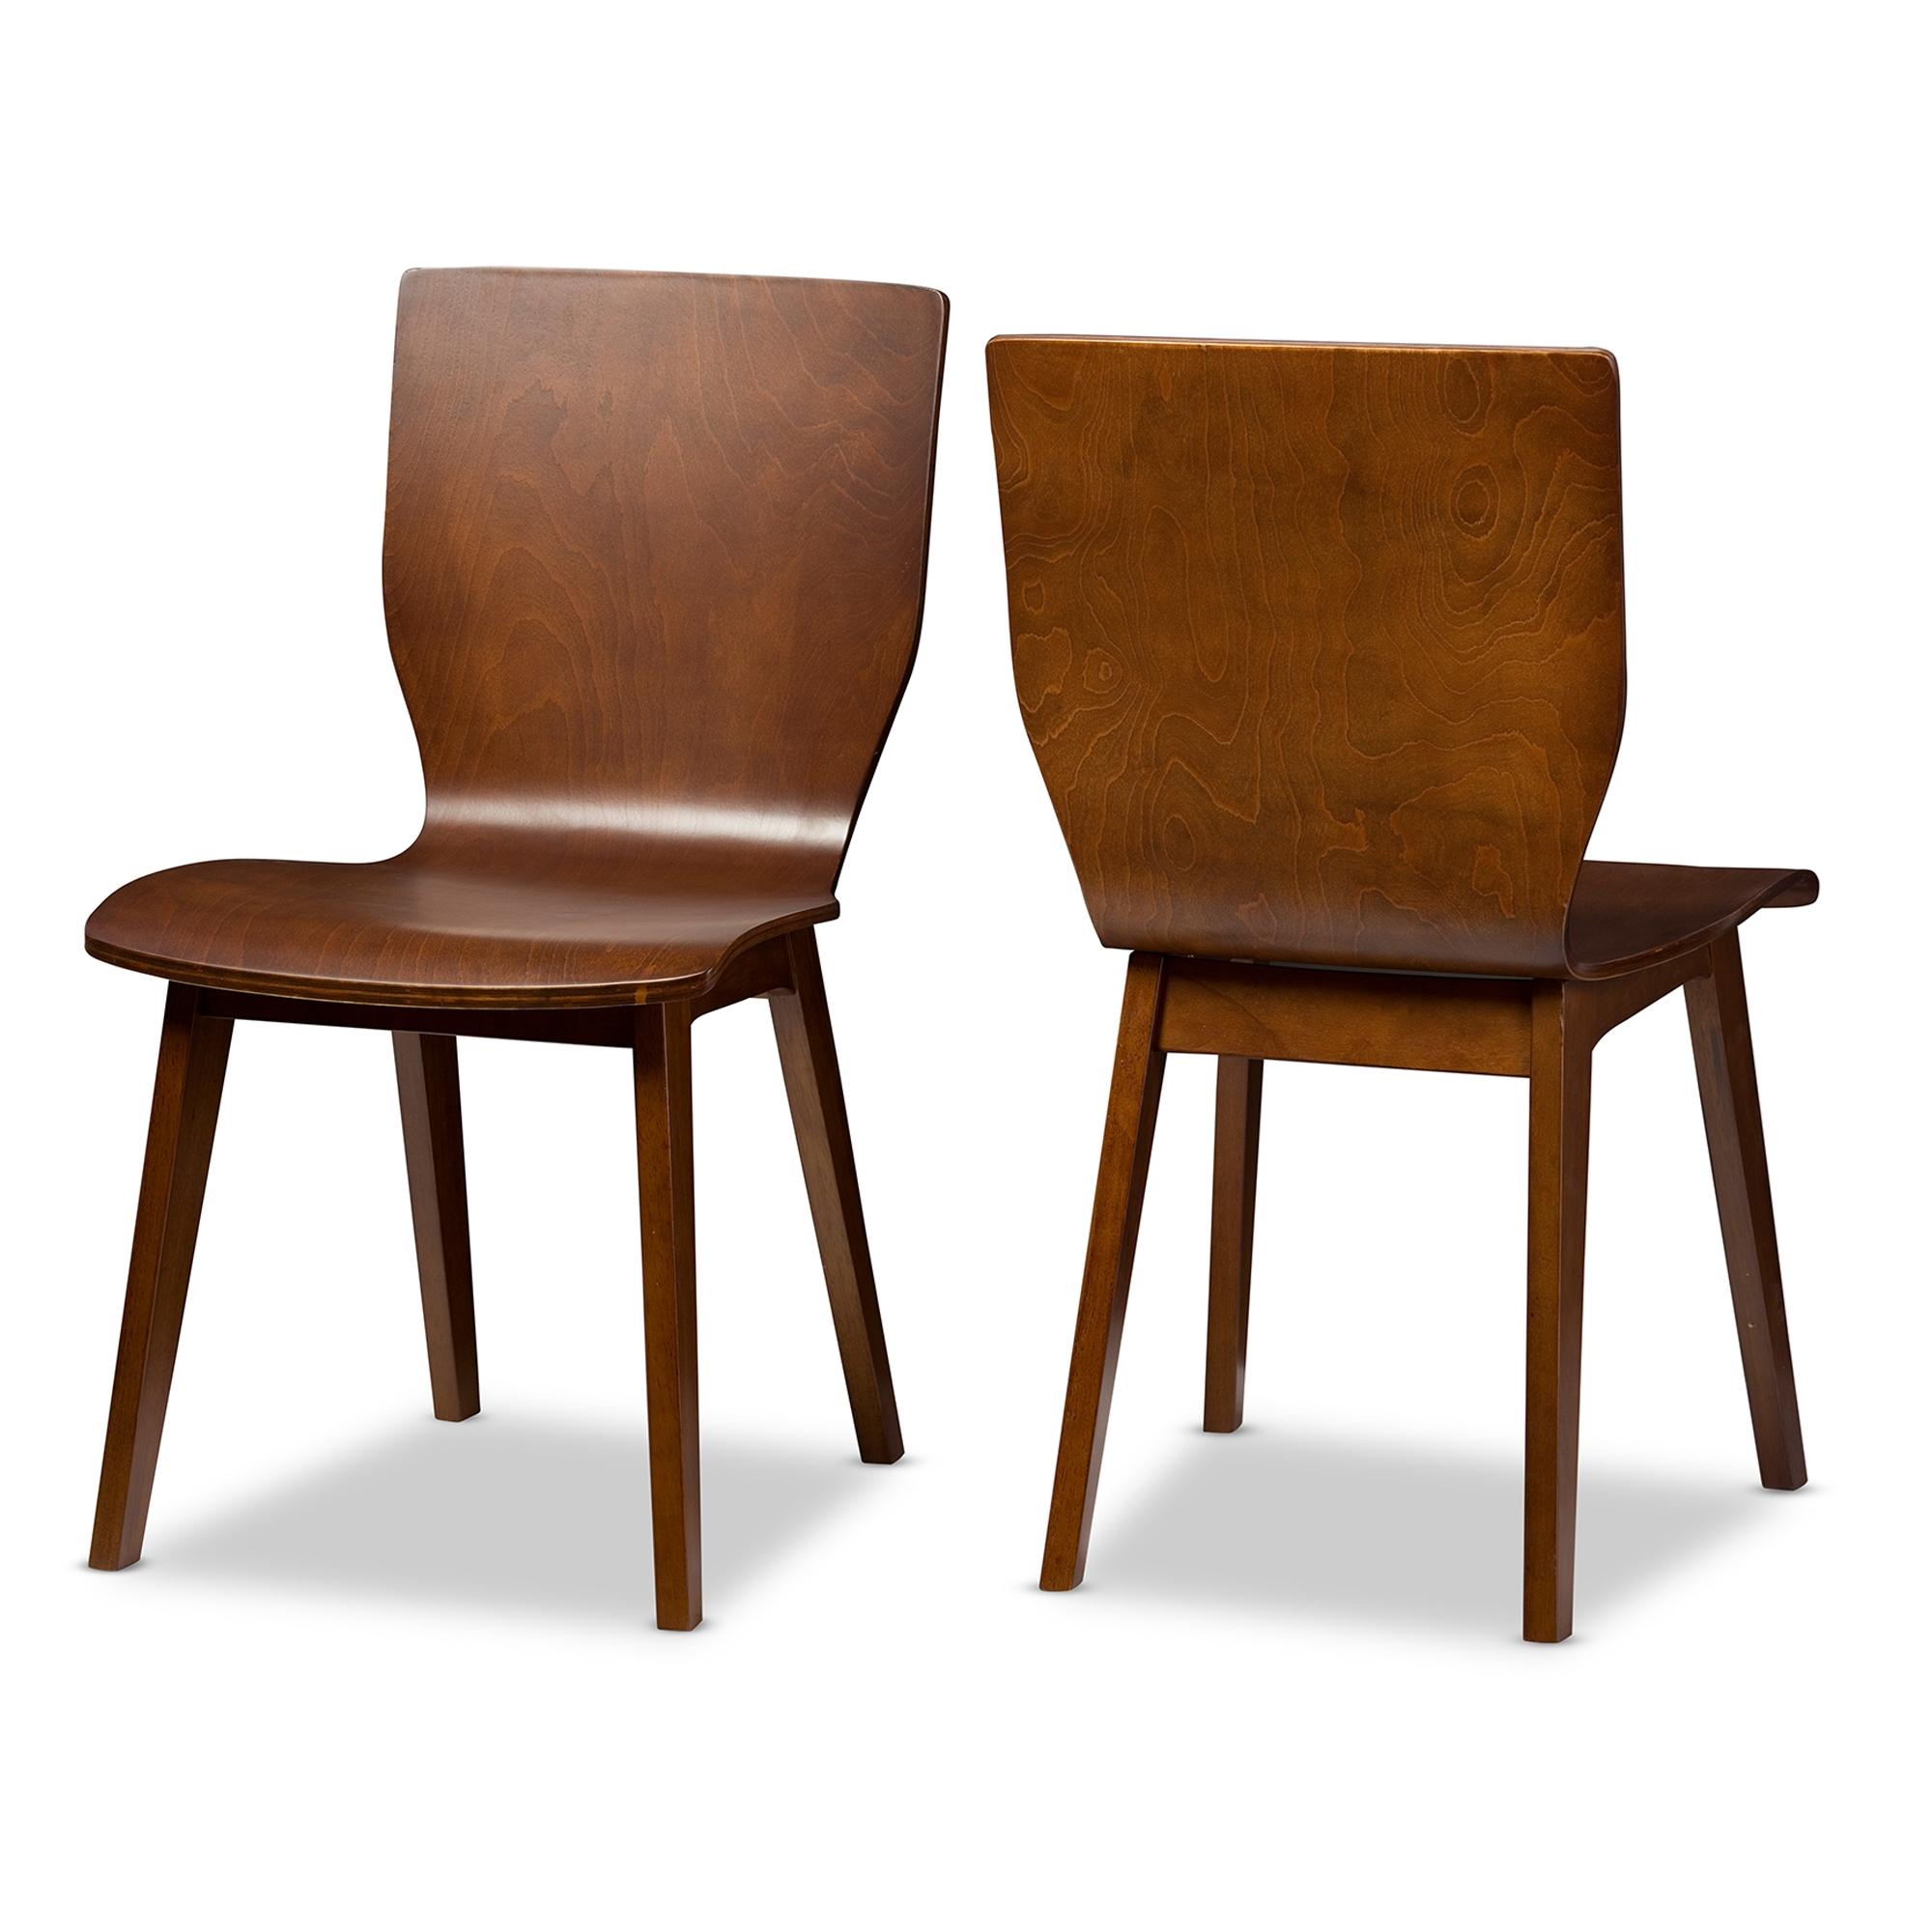 midcentury modern dining chairs. baxton studio elsa mid-century modern scandinavian style dark walnut bent wood dining chair midcentury chairs